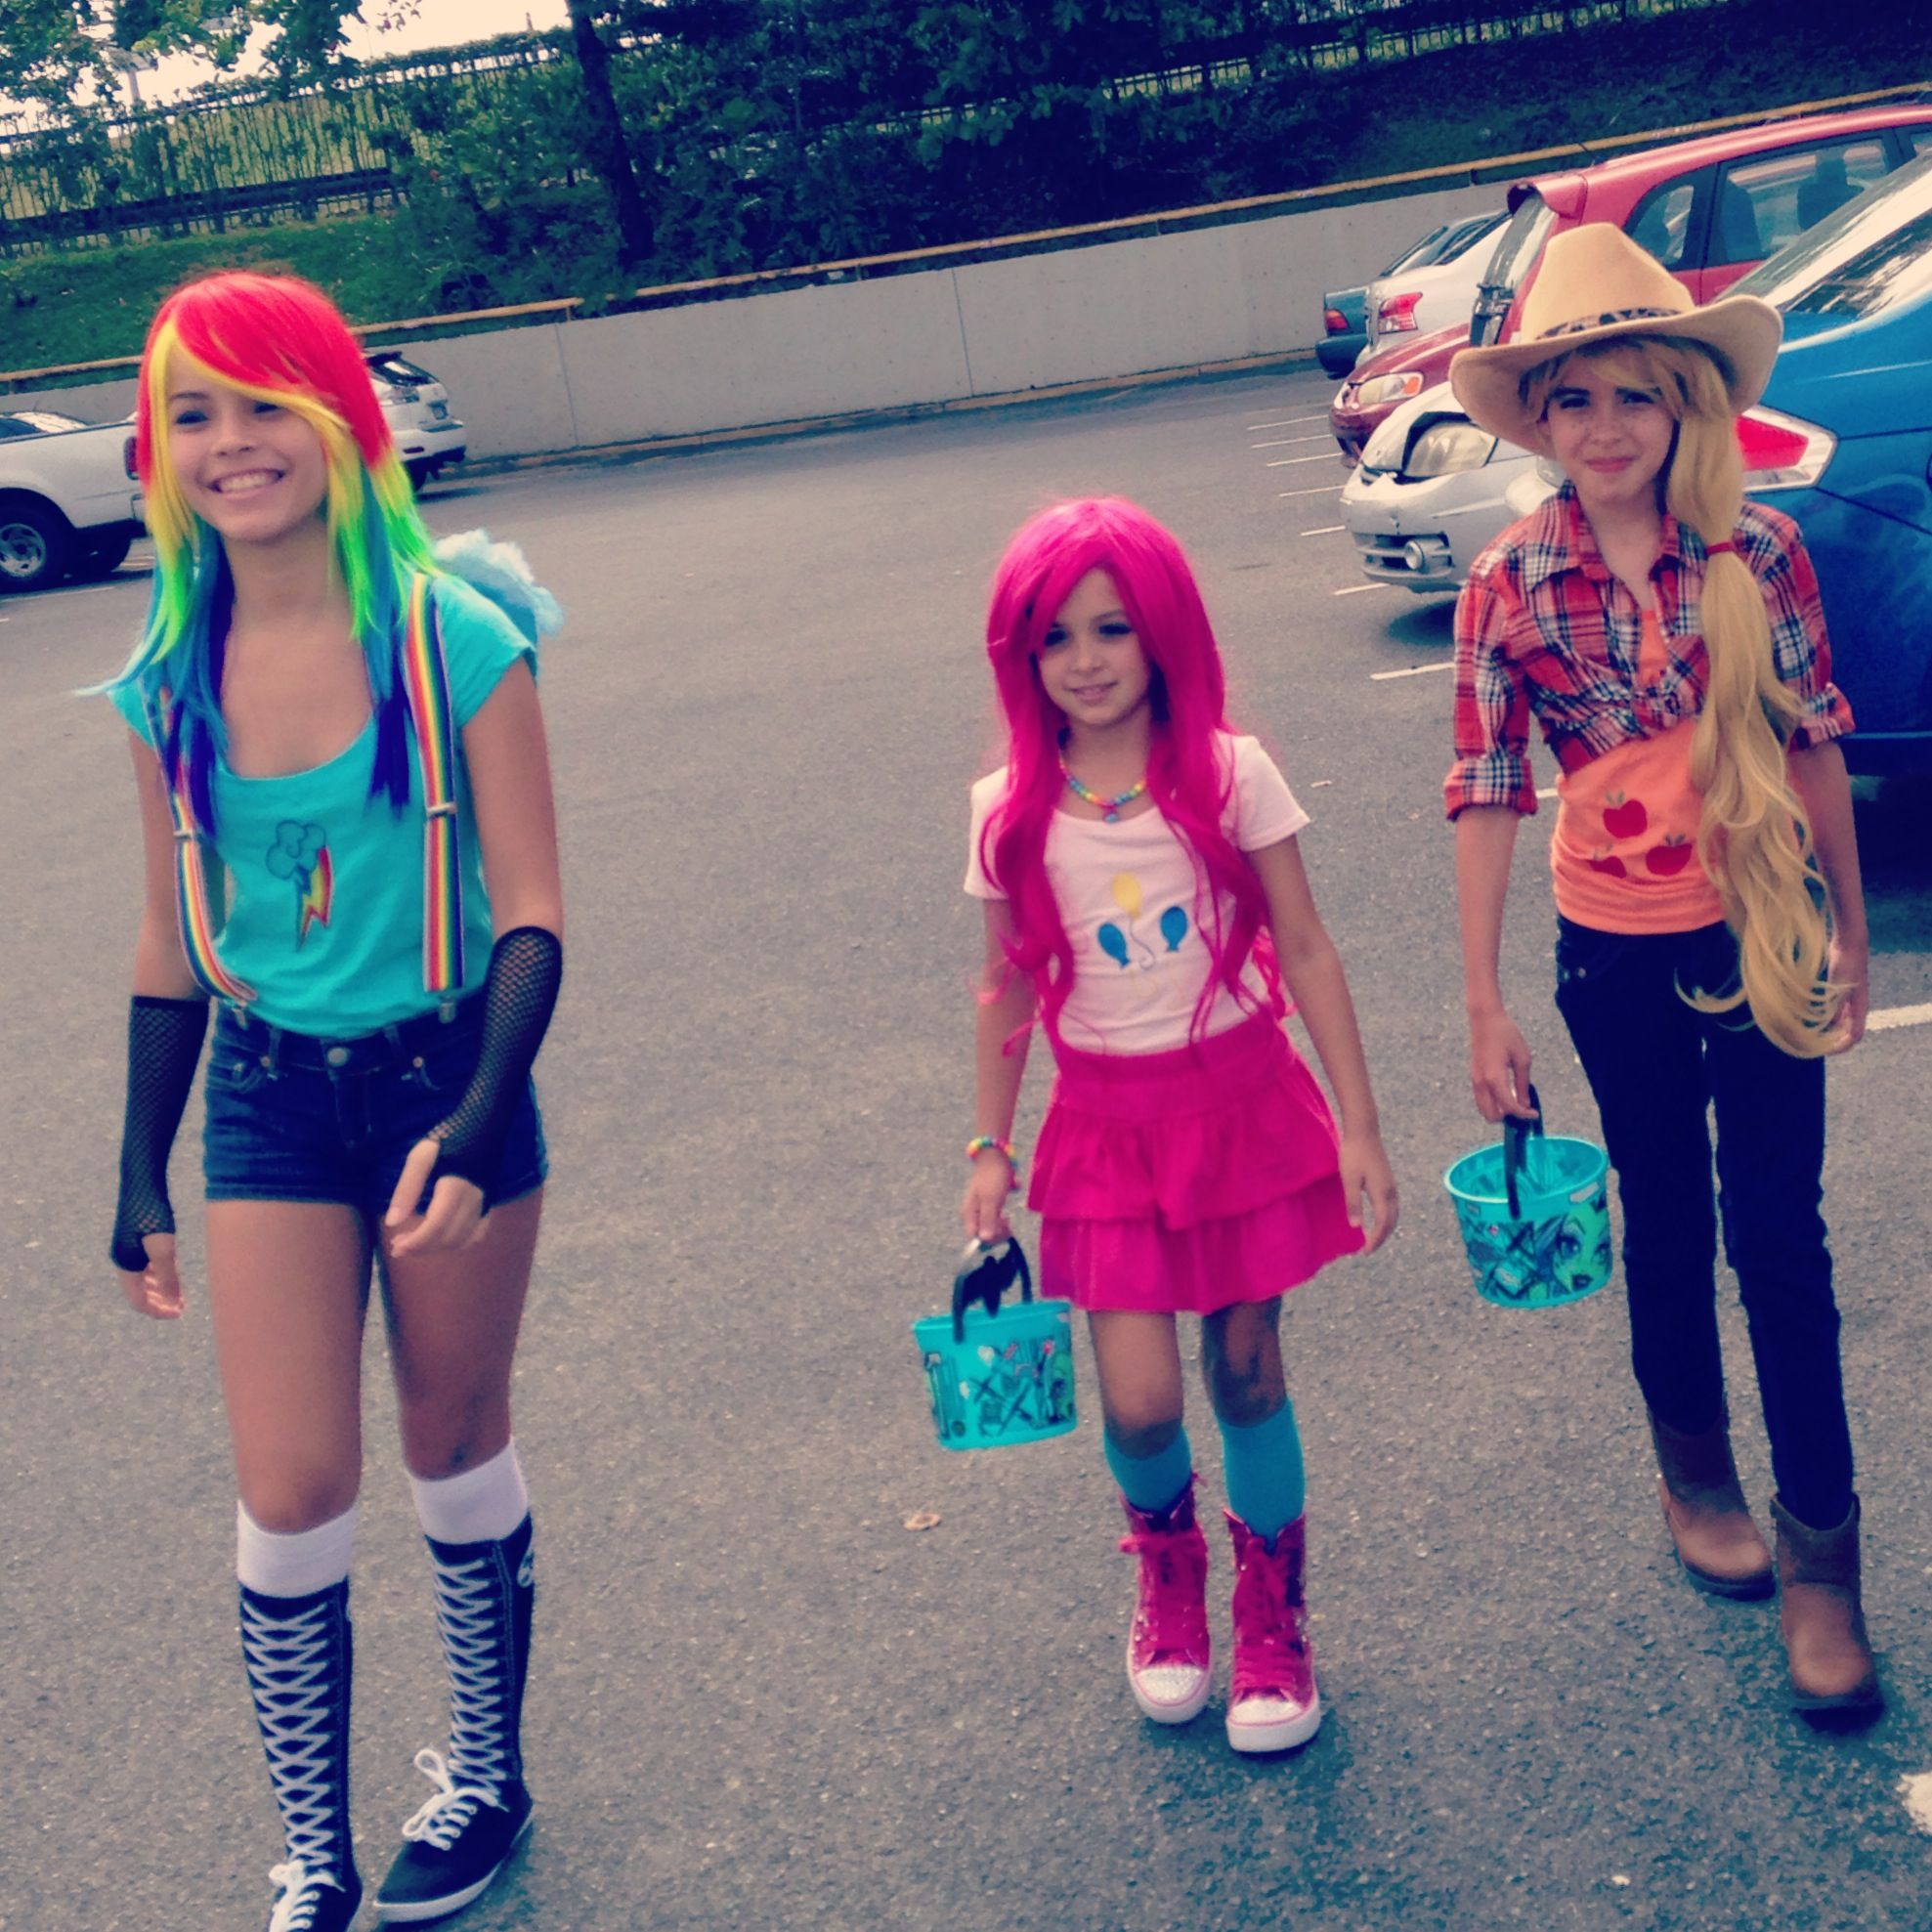 My little pony friendship is magic Halloween costumes Rainbow dash Pinkie pie Applejack  sc 1 st  Pinterest & My little pony friendship is magic Halloween costumes: Rainbow dash ...